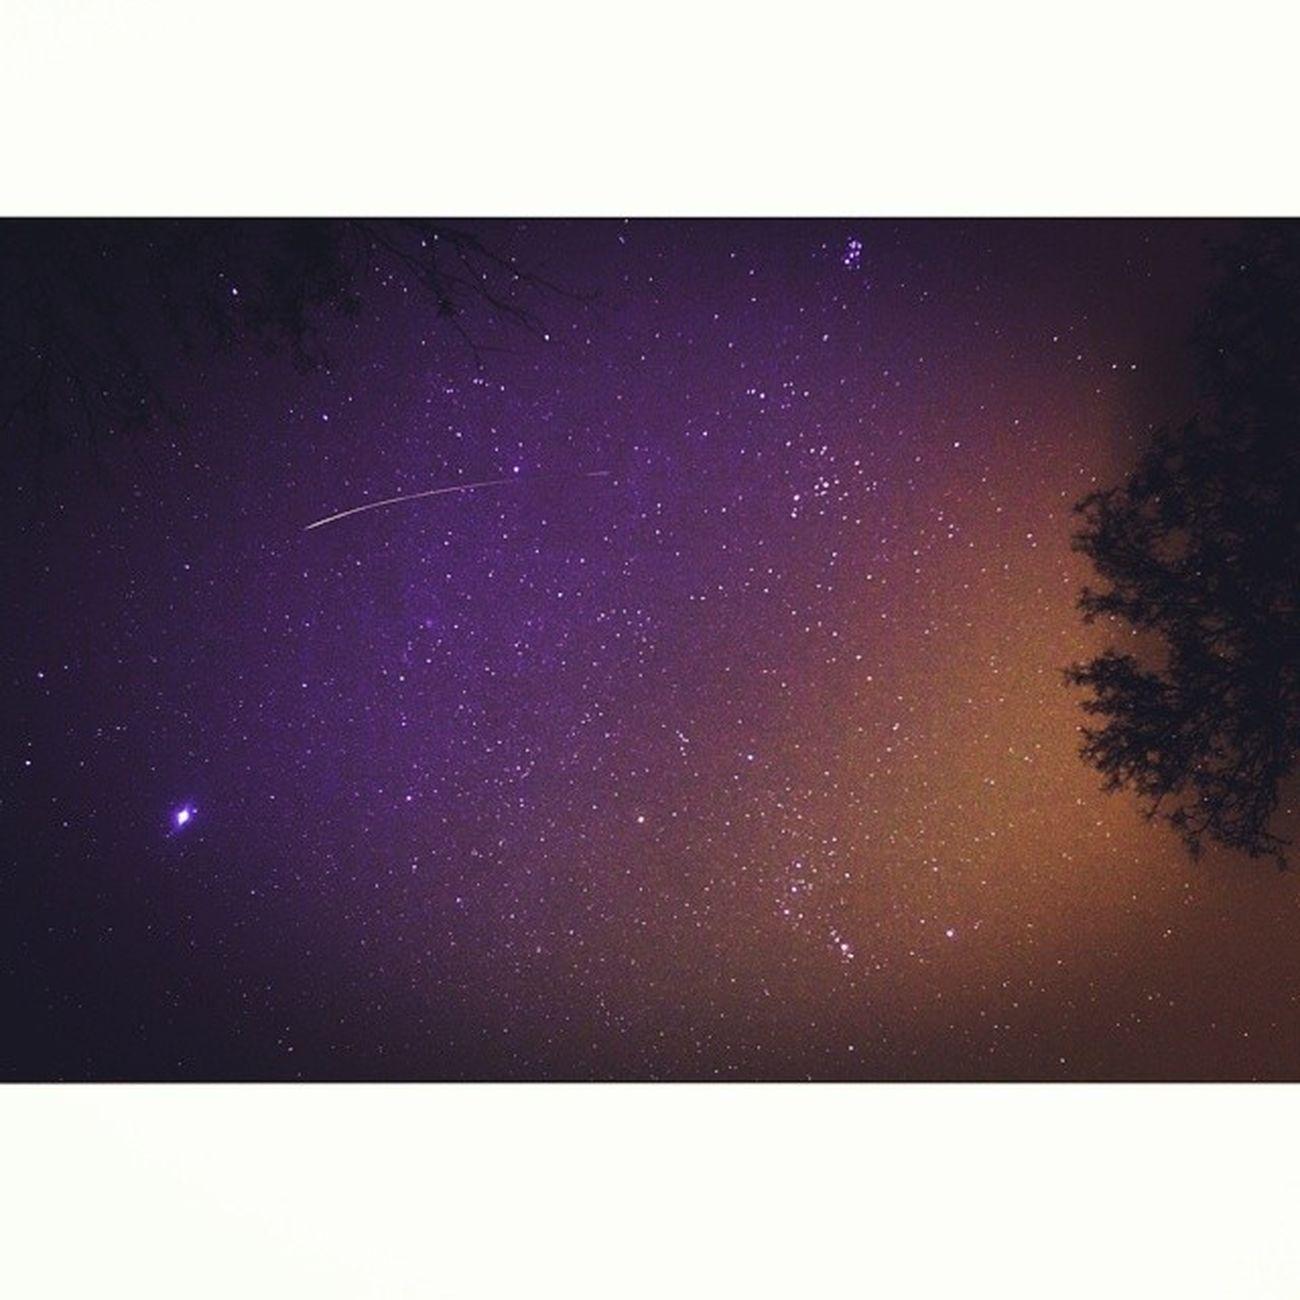 Take me now so I can wake up and drift away... Seeingstars Lightpollution Shootingstar Nightsky Starporn Tucson Latergram